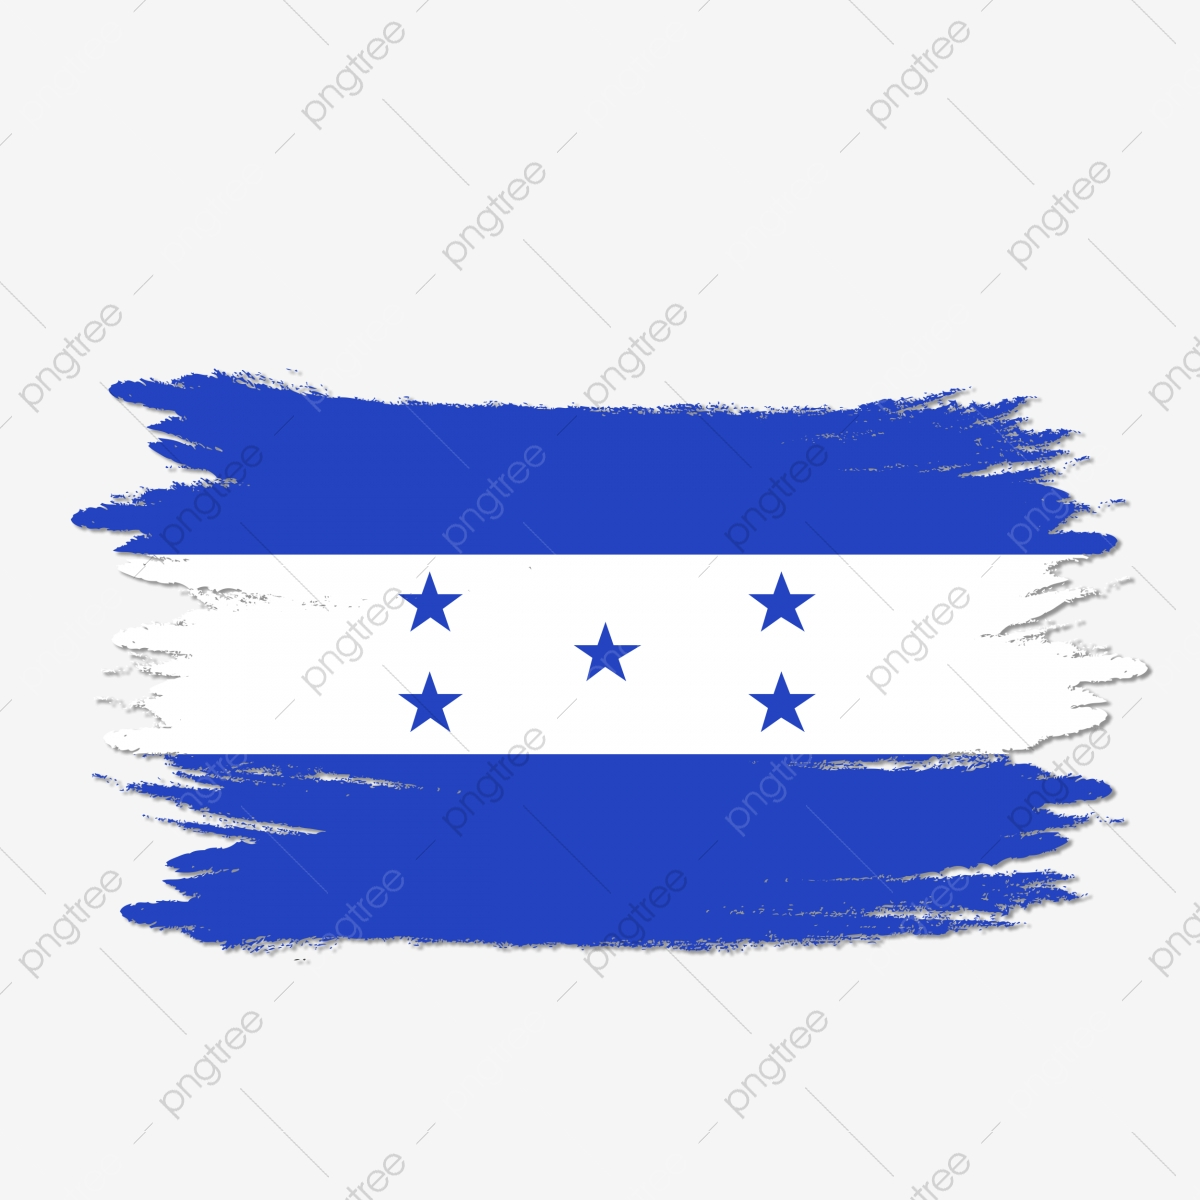 Bandera De Honduras Cepillo Pintado Acuarela Transparente